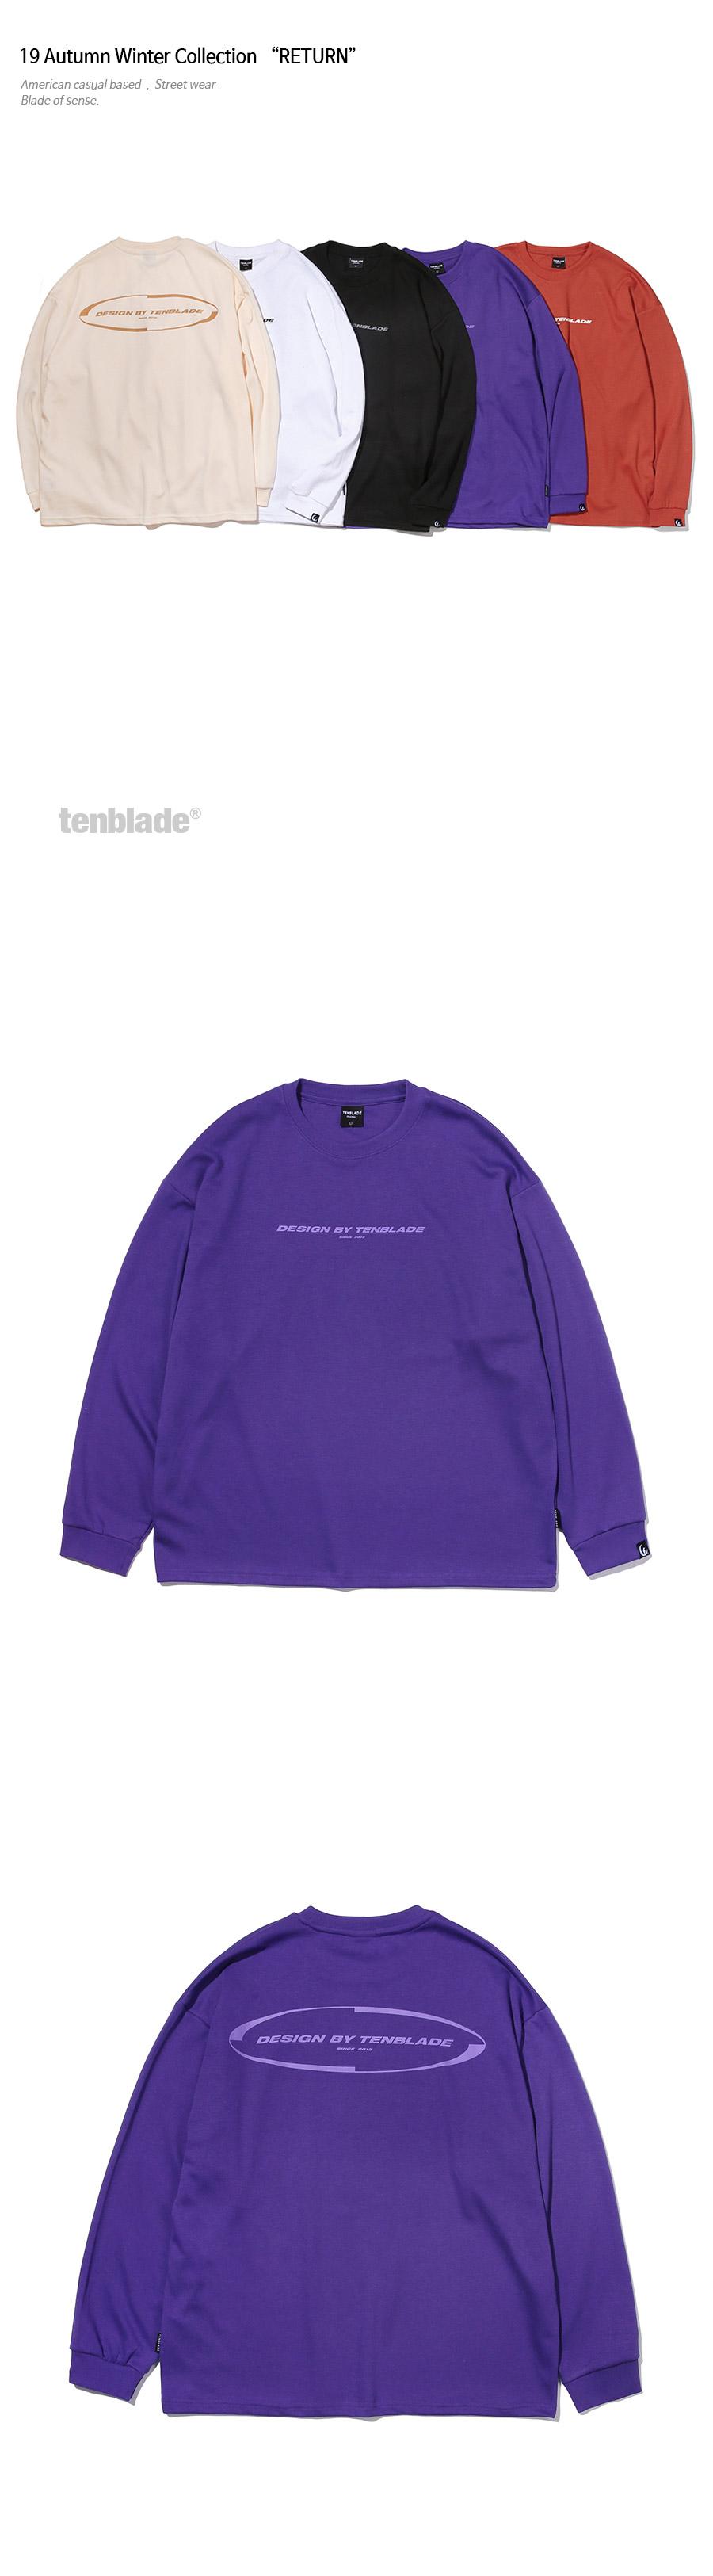 tai261ls-purple_05.jpg